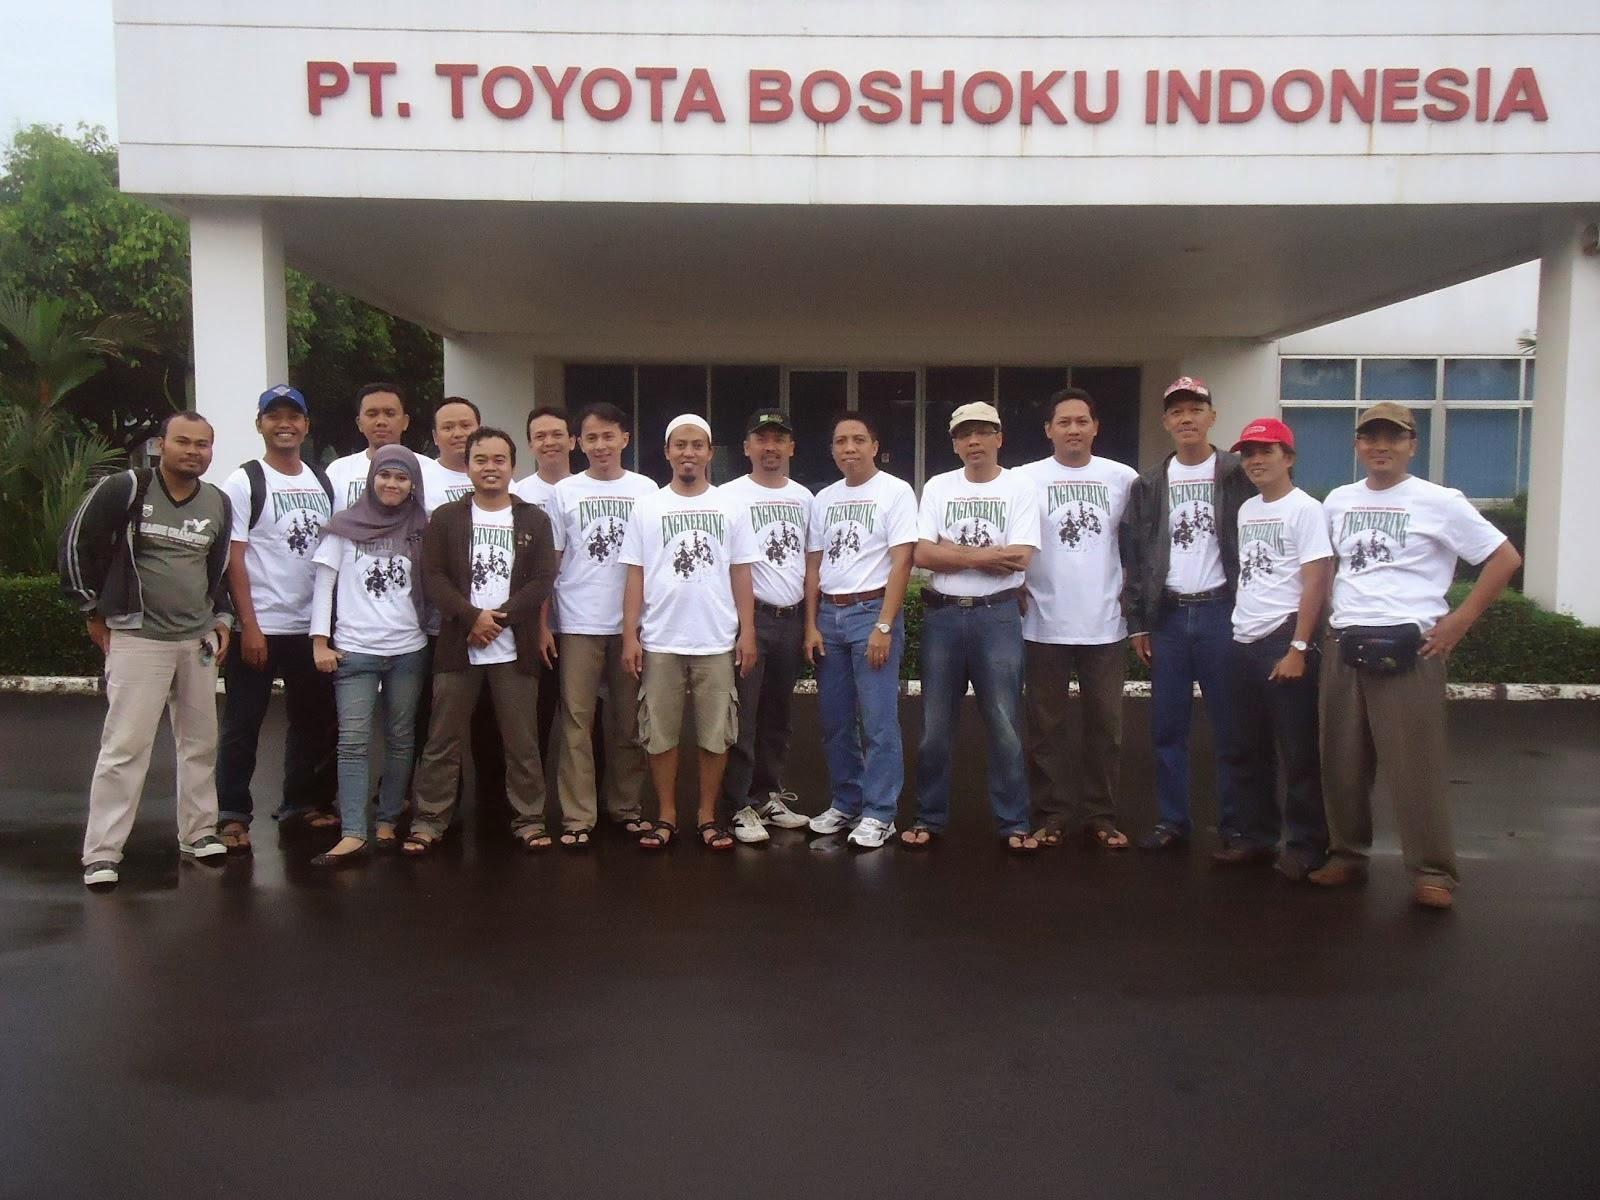 "<img src=""Image URL"" title=""PT Toyota Boshoku Indonesia"" alt=""TBINA""/>"